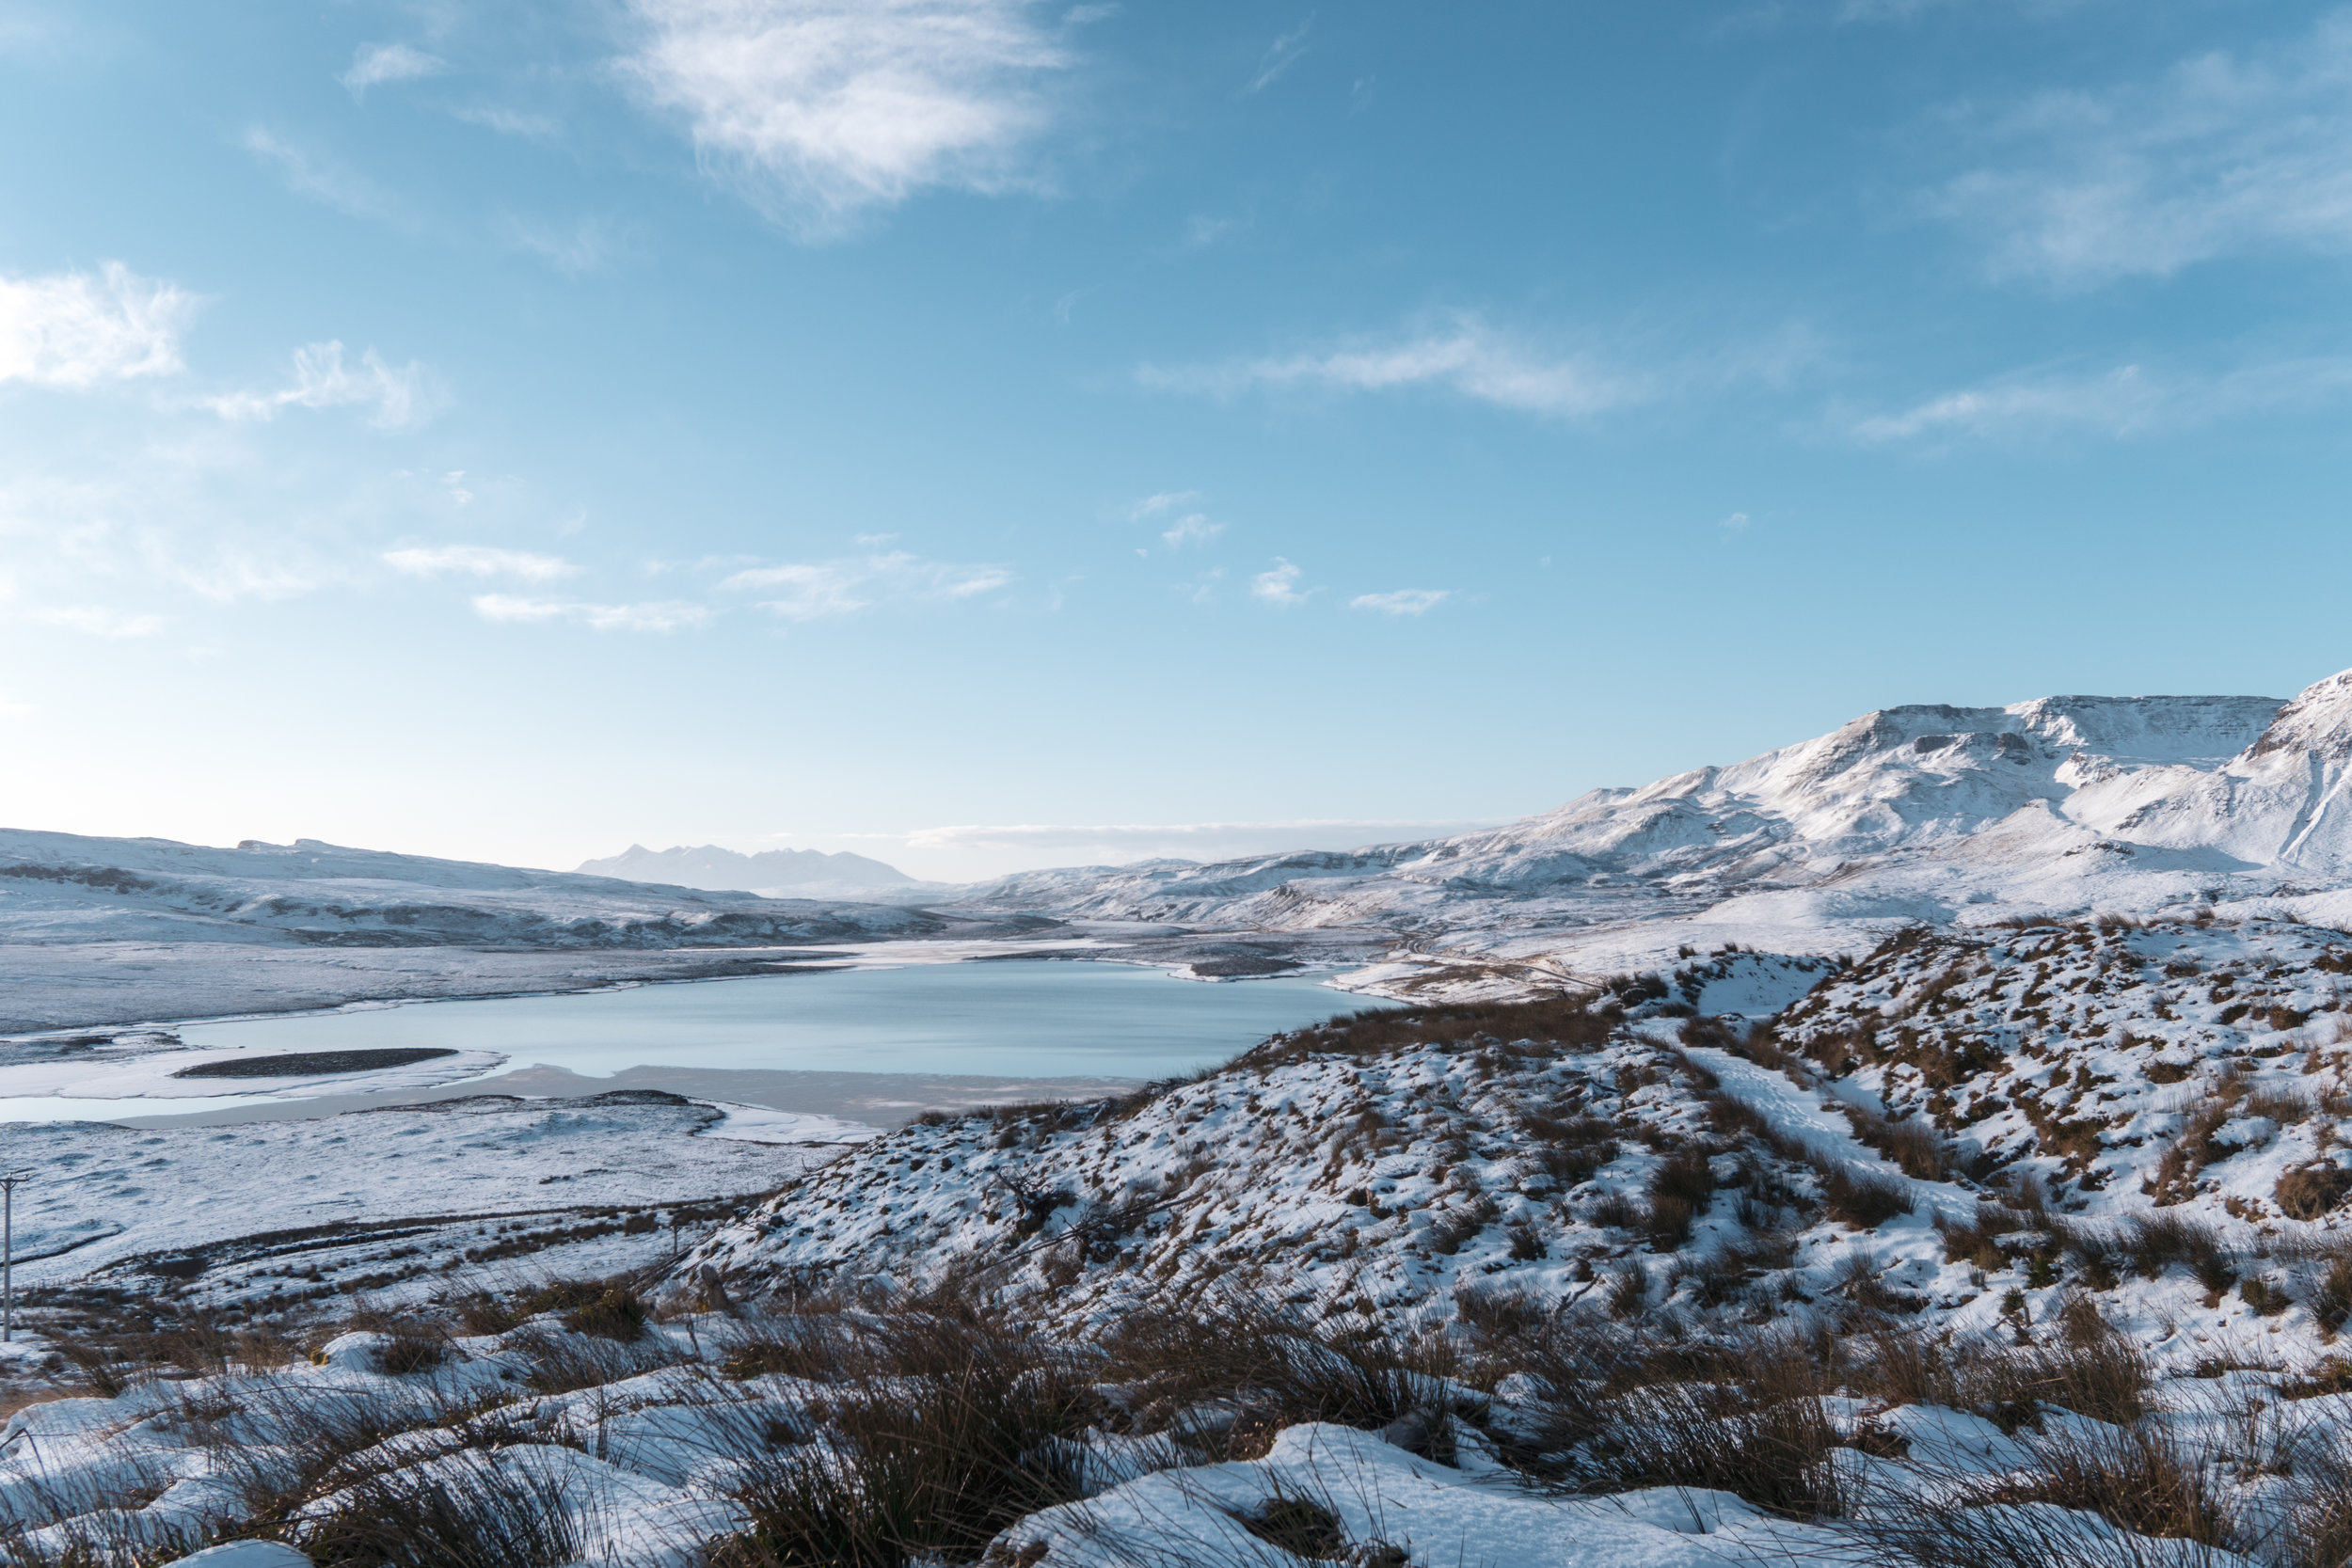 Isle-of-Skye-Winter-2019-Trotternish (17).jpg